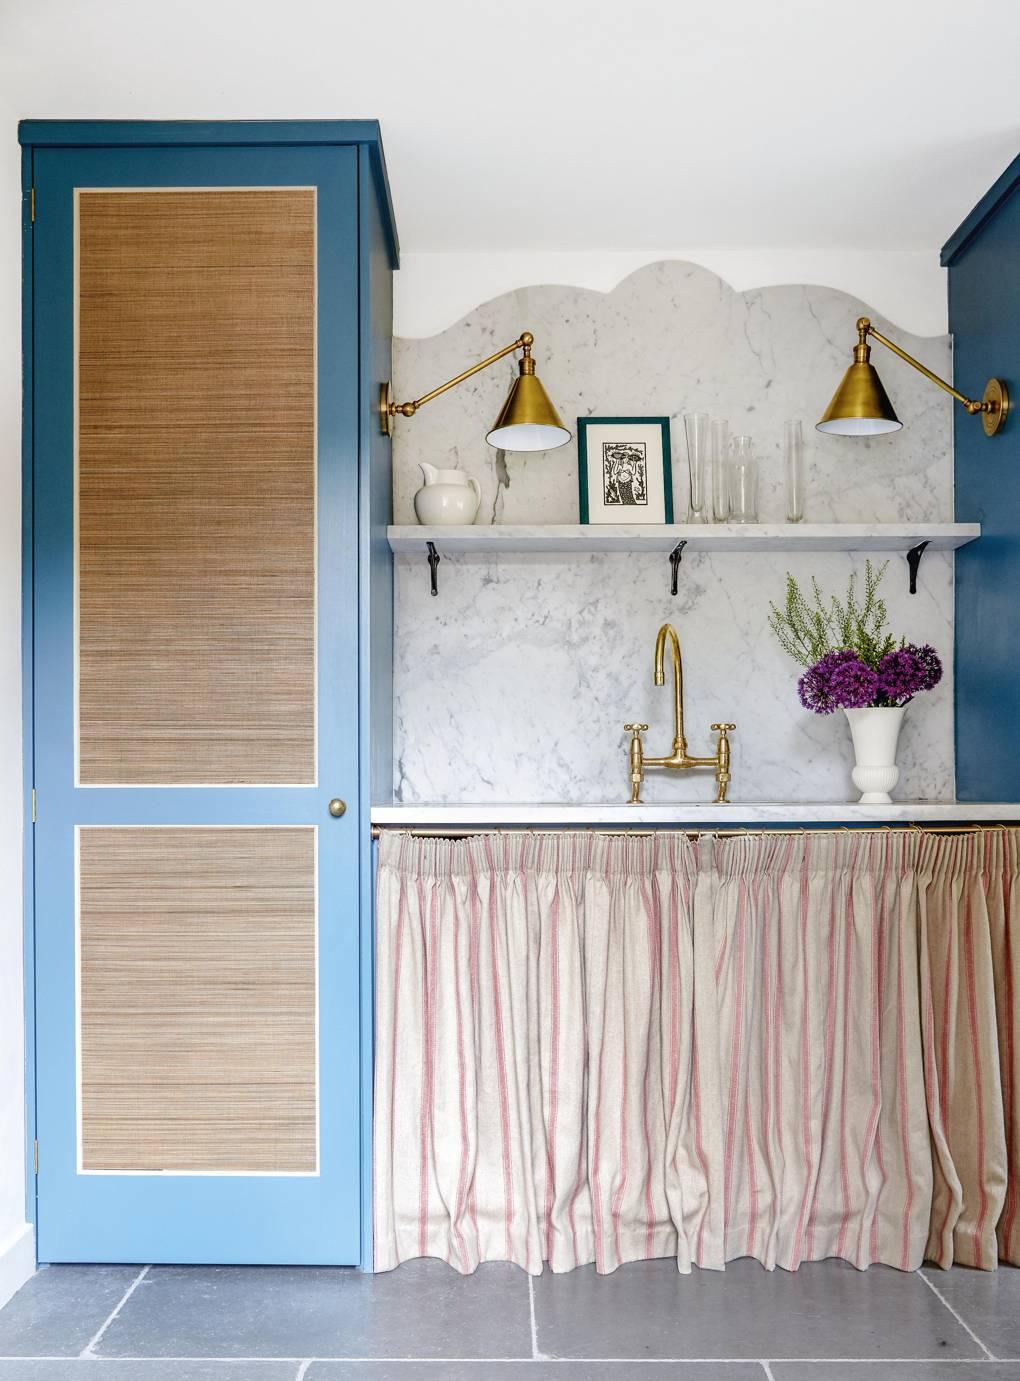 Beata Heuman utility room